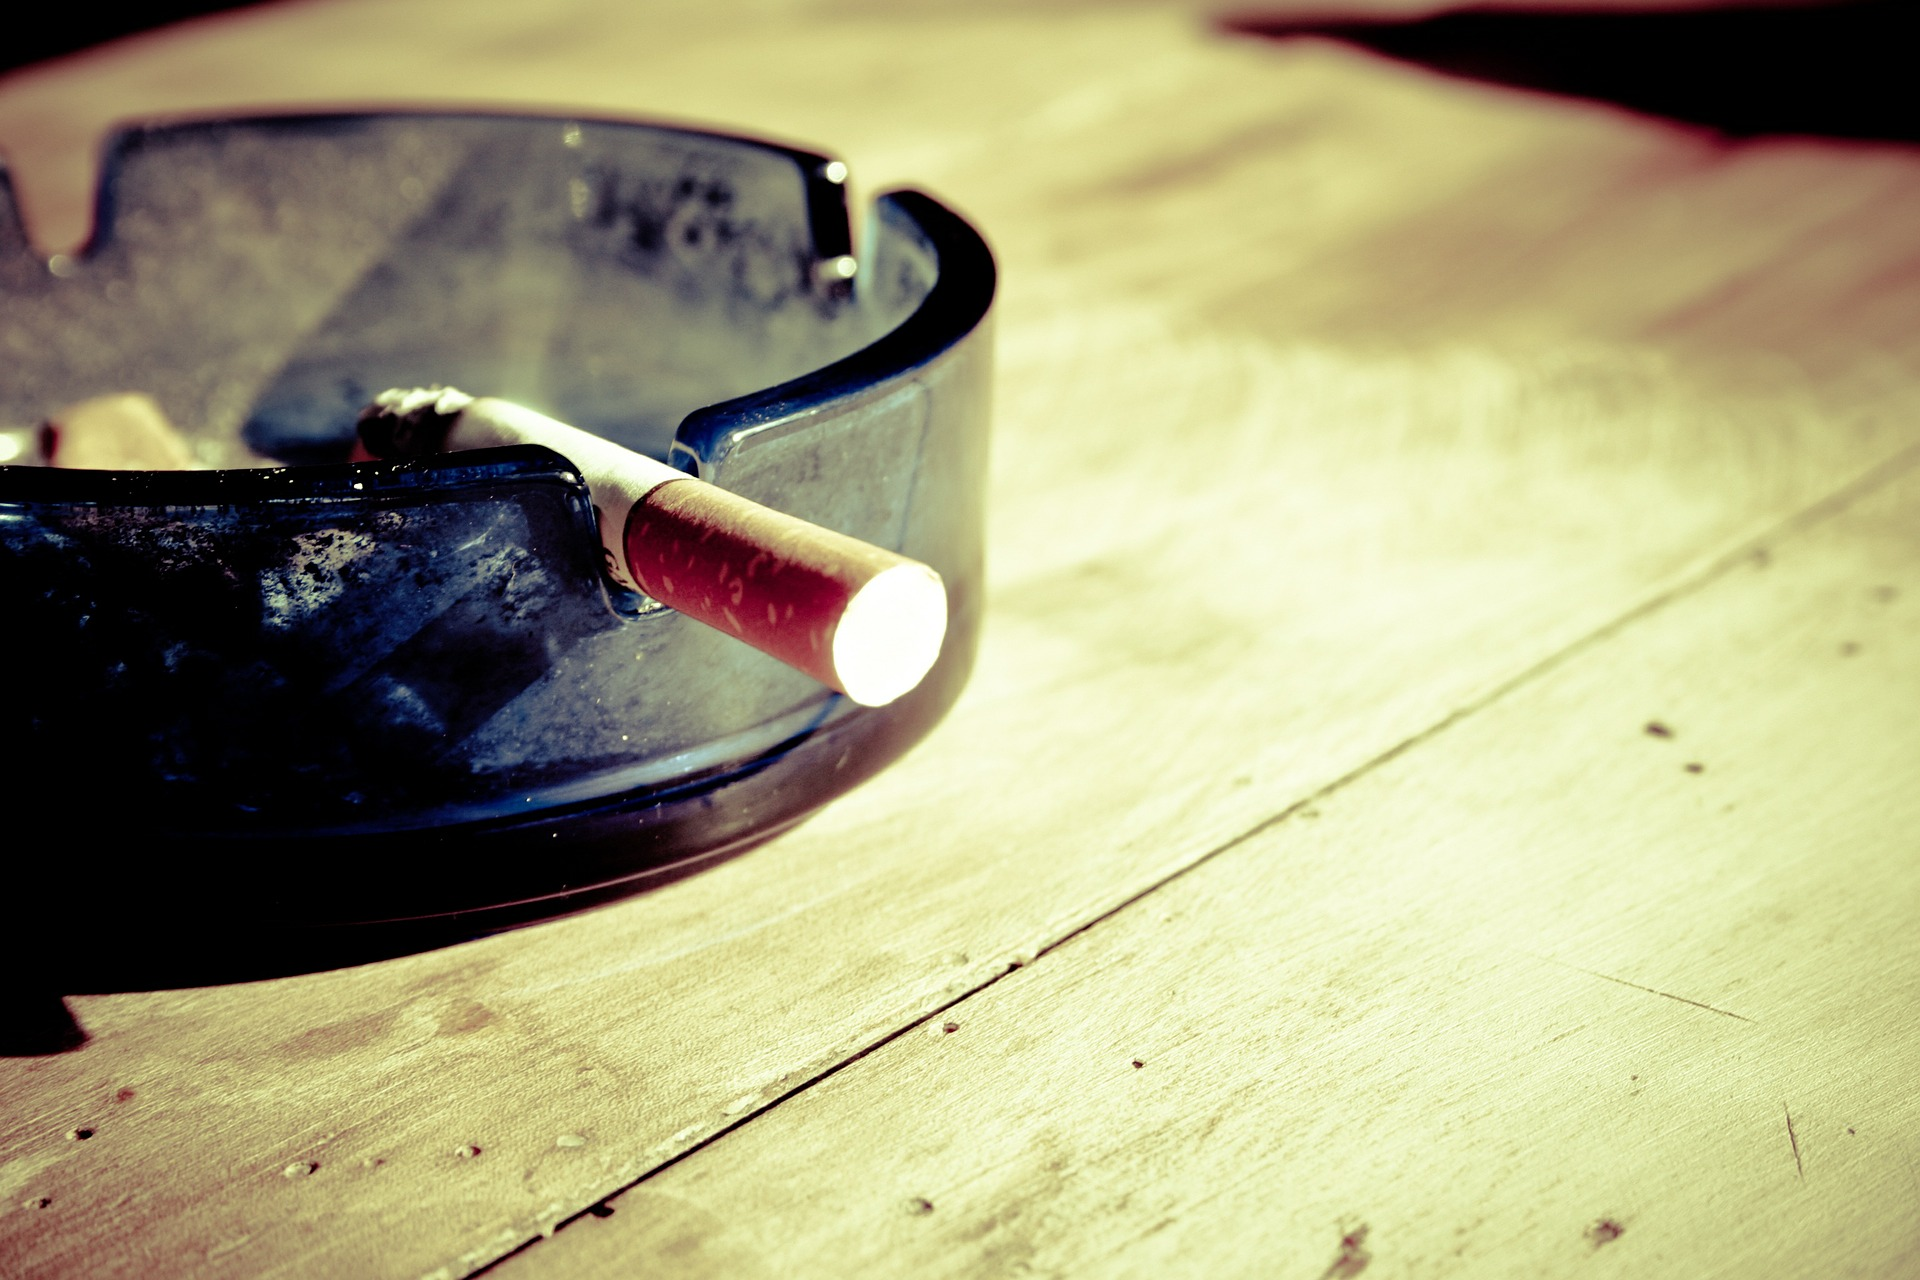 Cigaretni dim škoduje tudi hišnim ljubljenčkom